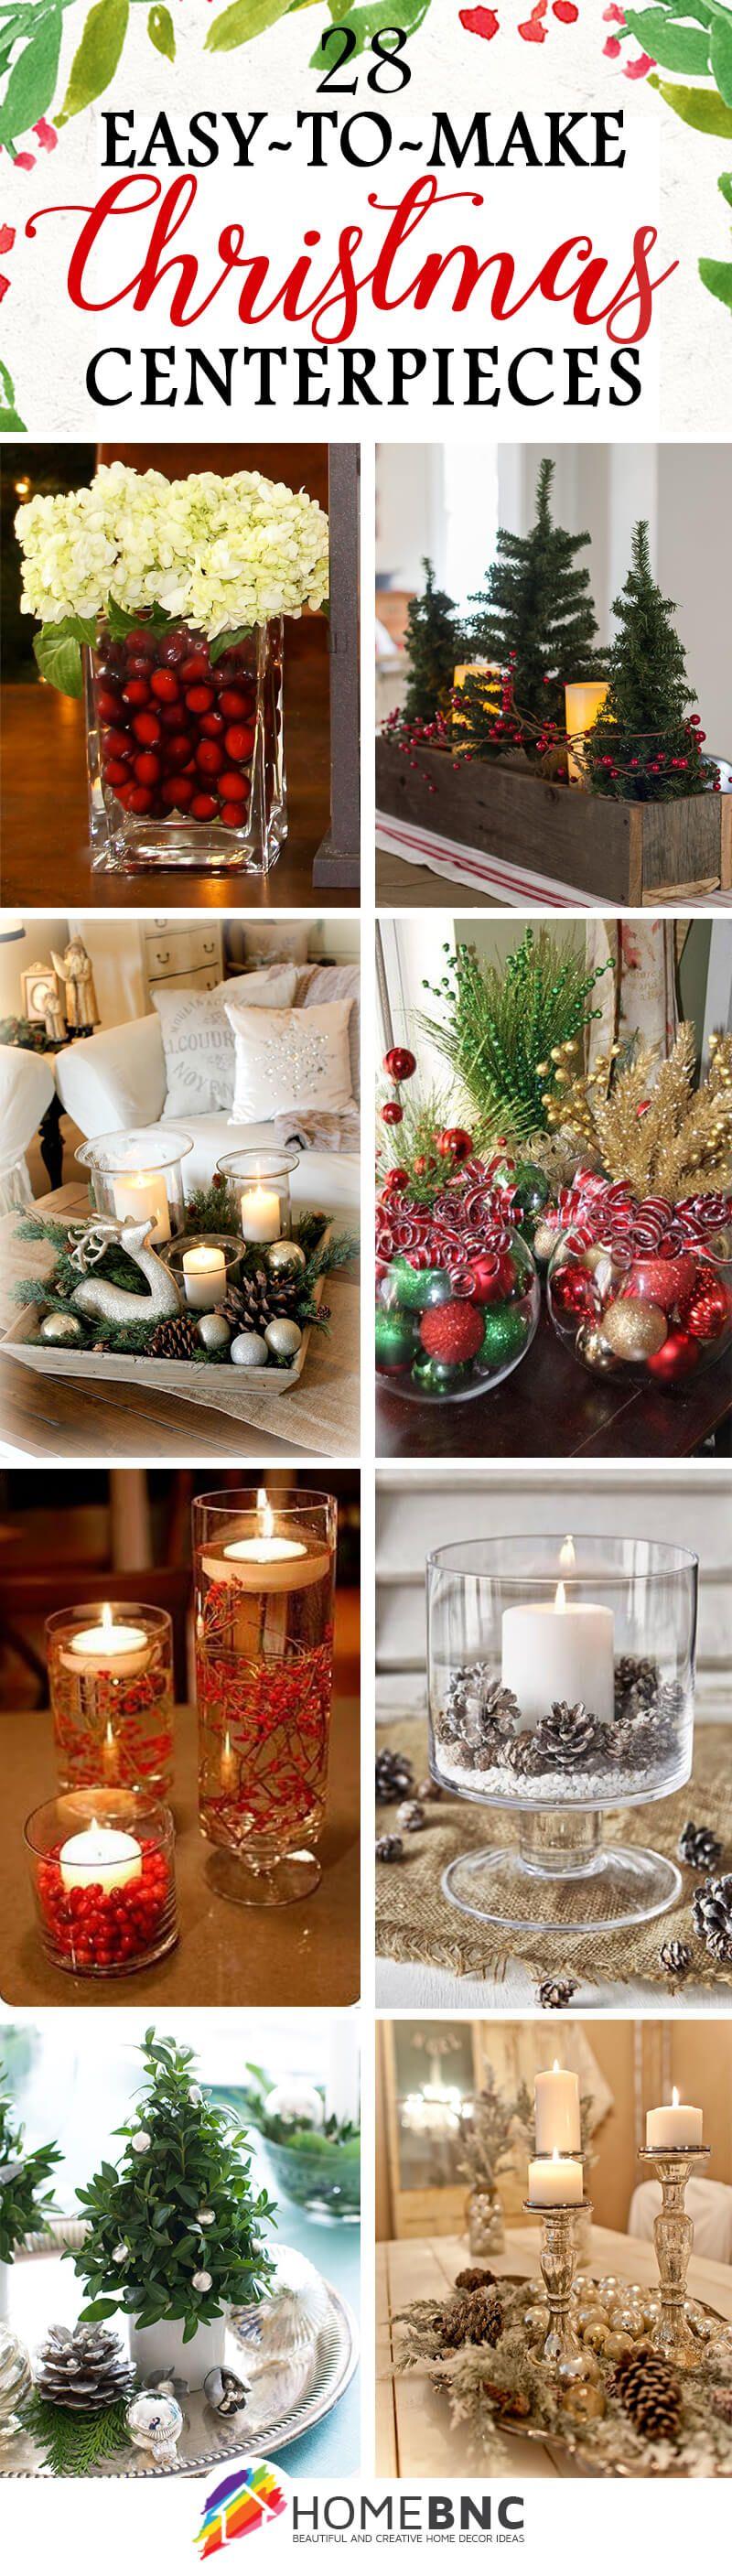 fabulous diy christmas centerpieces that anyone can make